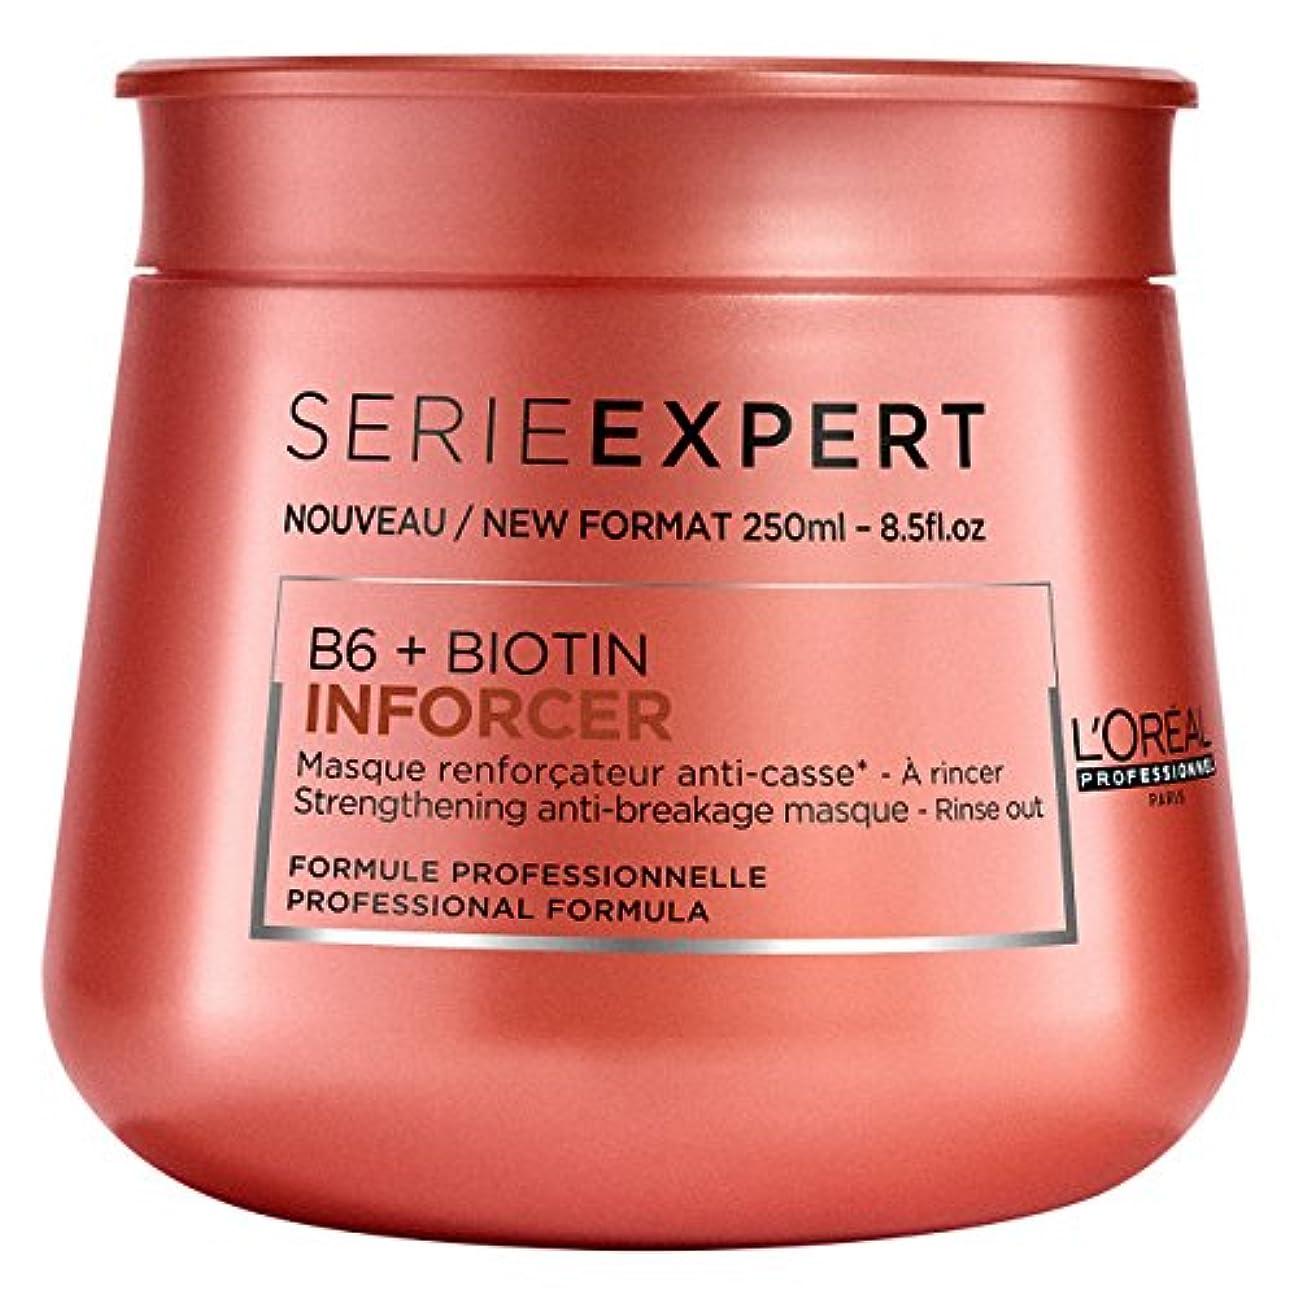 映画ペルー特異性L'Oreal Serie Expert B6 + Biotin INFORCER Strengthening Anti-Breakage Masque 250 ml [並行輸入品]